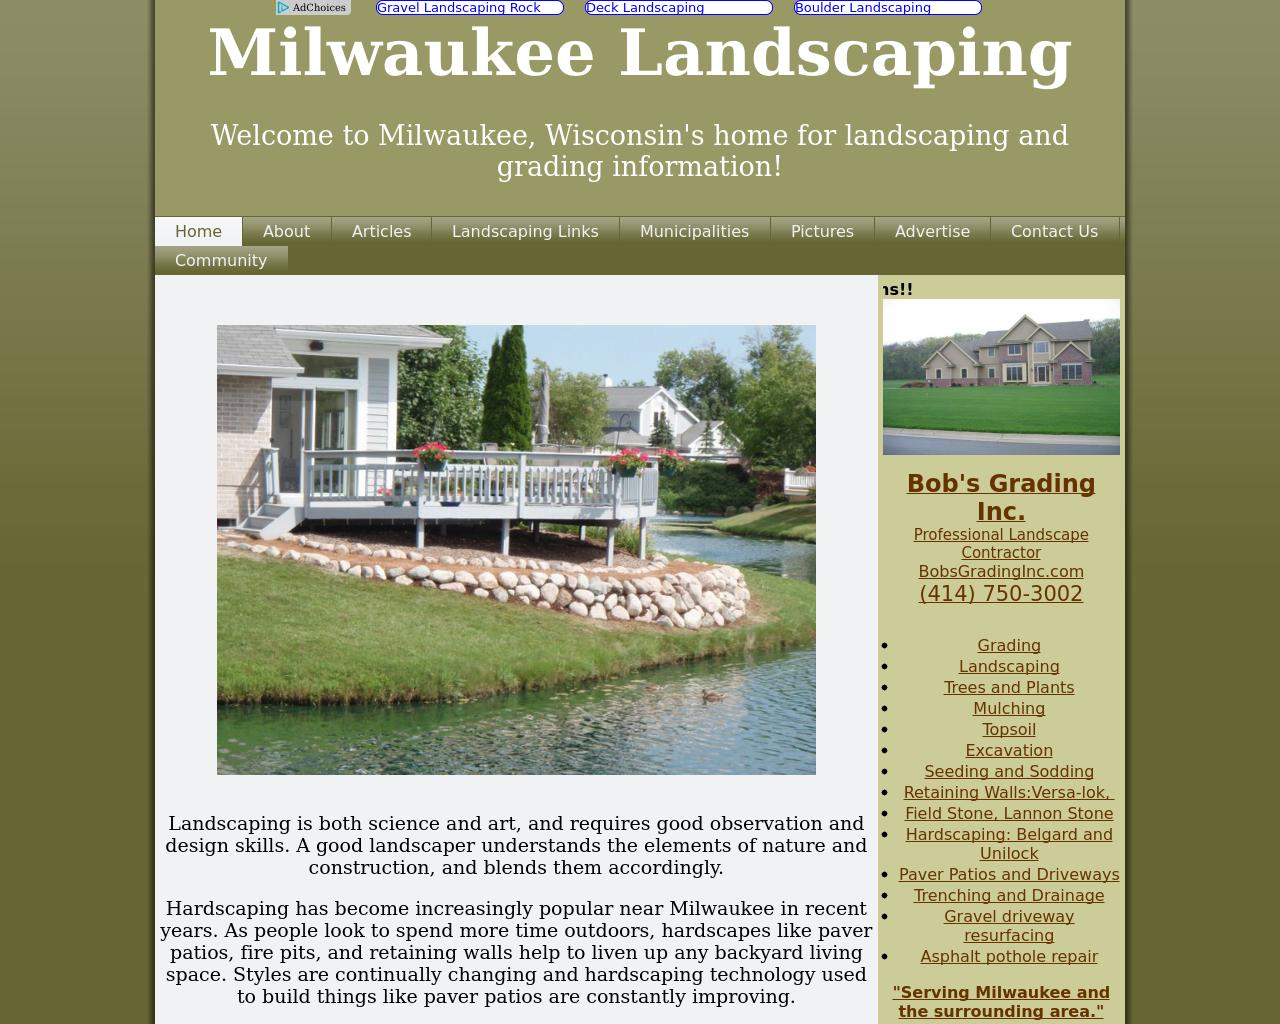 Milwaukee-Landscaping-Advertising-Reviews-Pricing